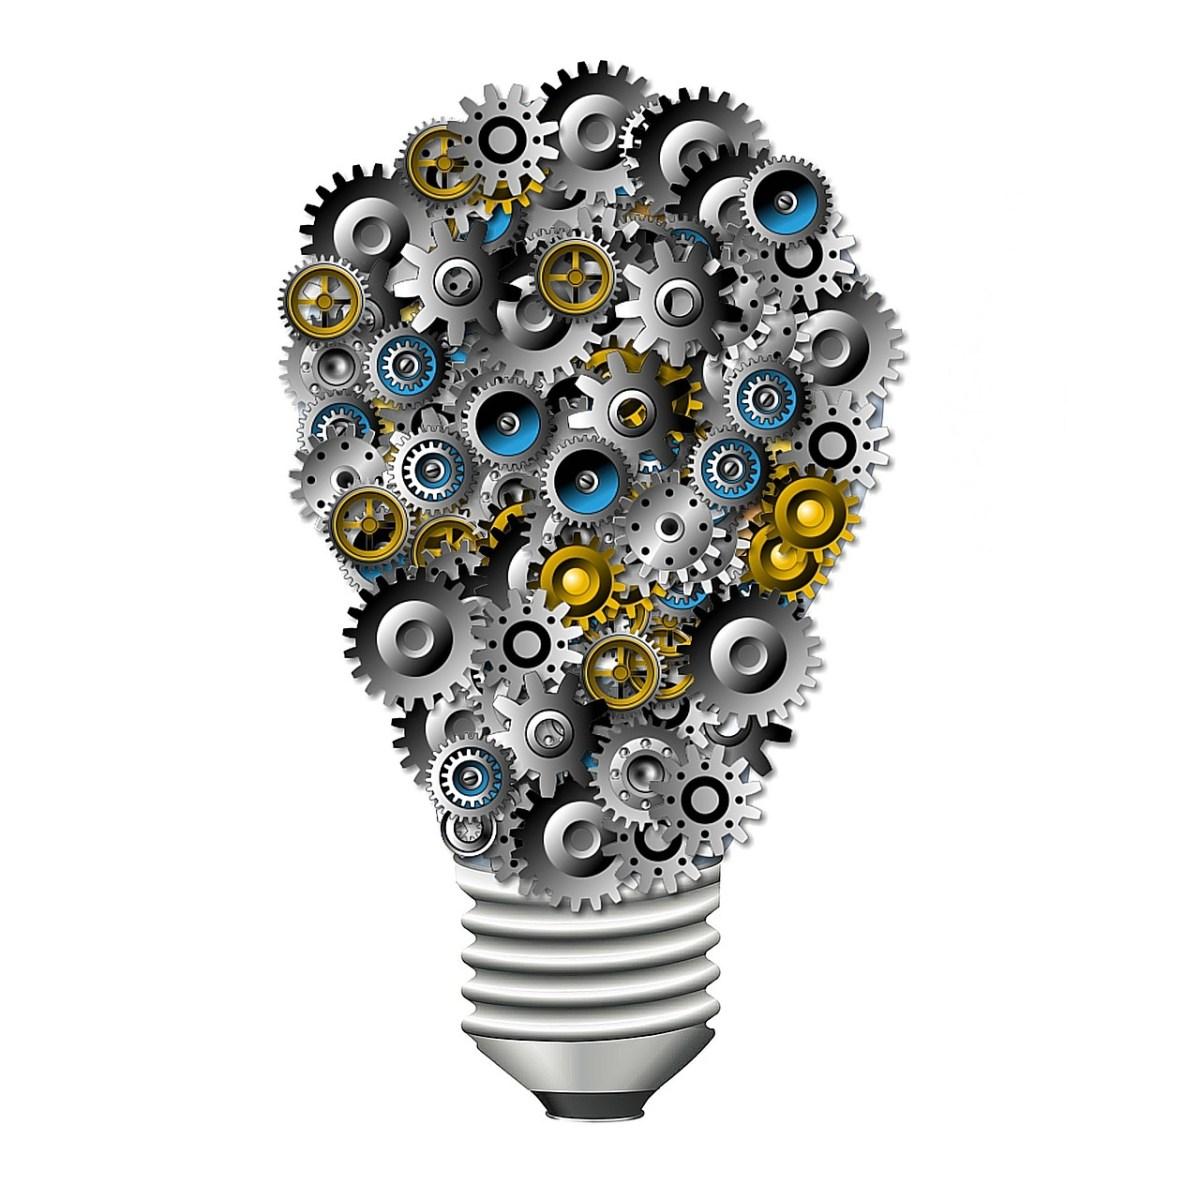 El Impacto Innovador: de I+D+i a 3I+D, 4I+D … 4I+2D